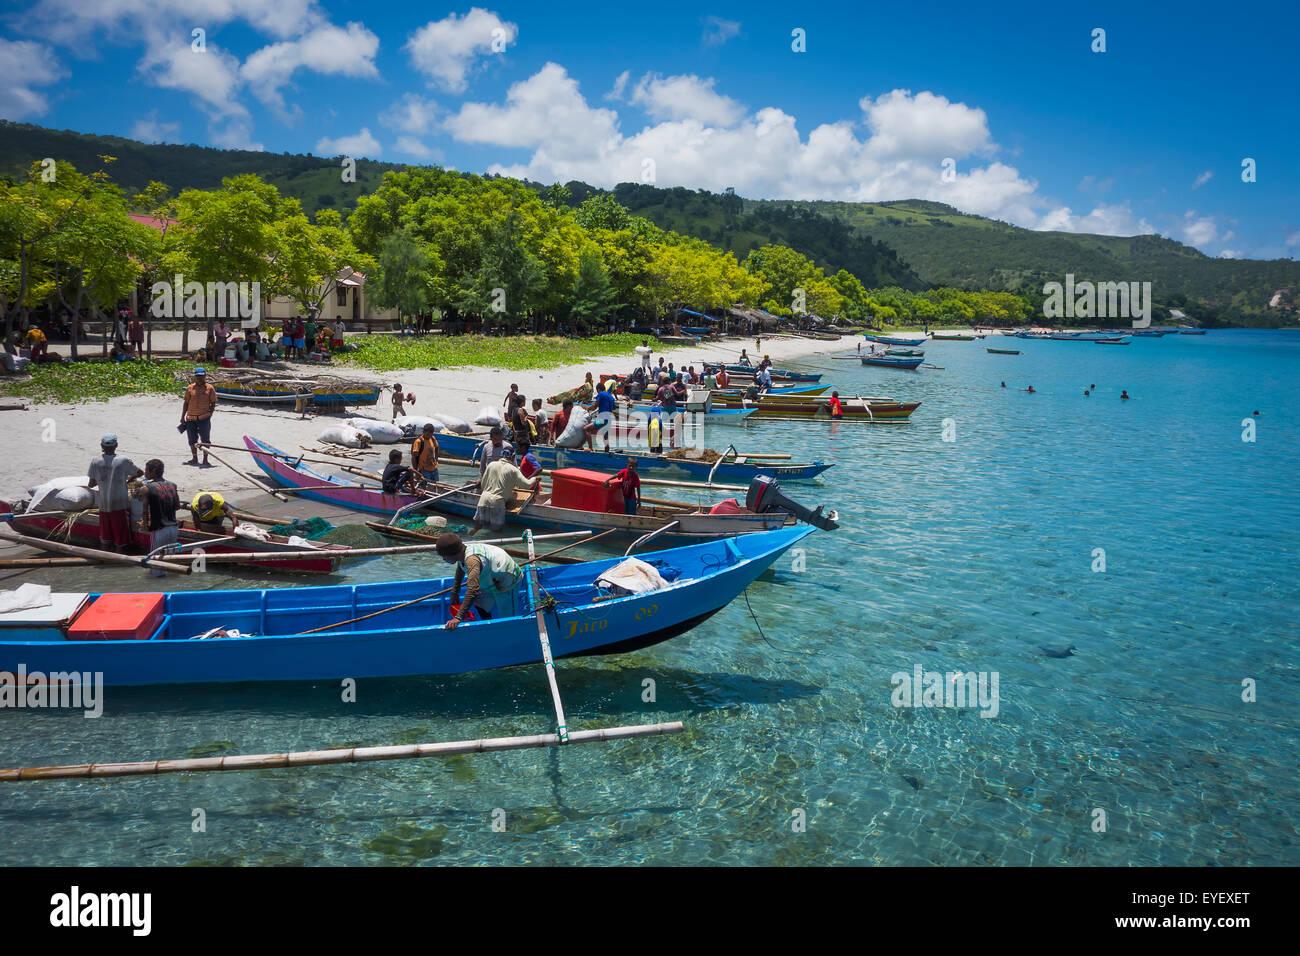 Boats lined up along the shore of Atauro Island beach; Atauro Island, Timor-Leste Stock Photo